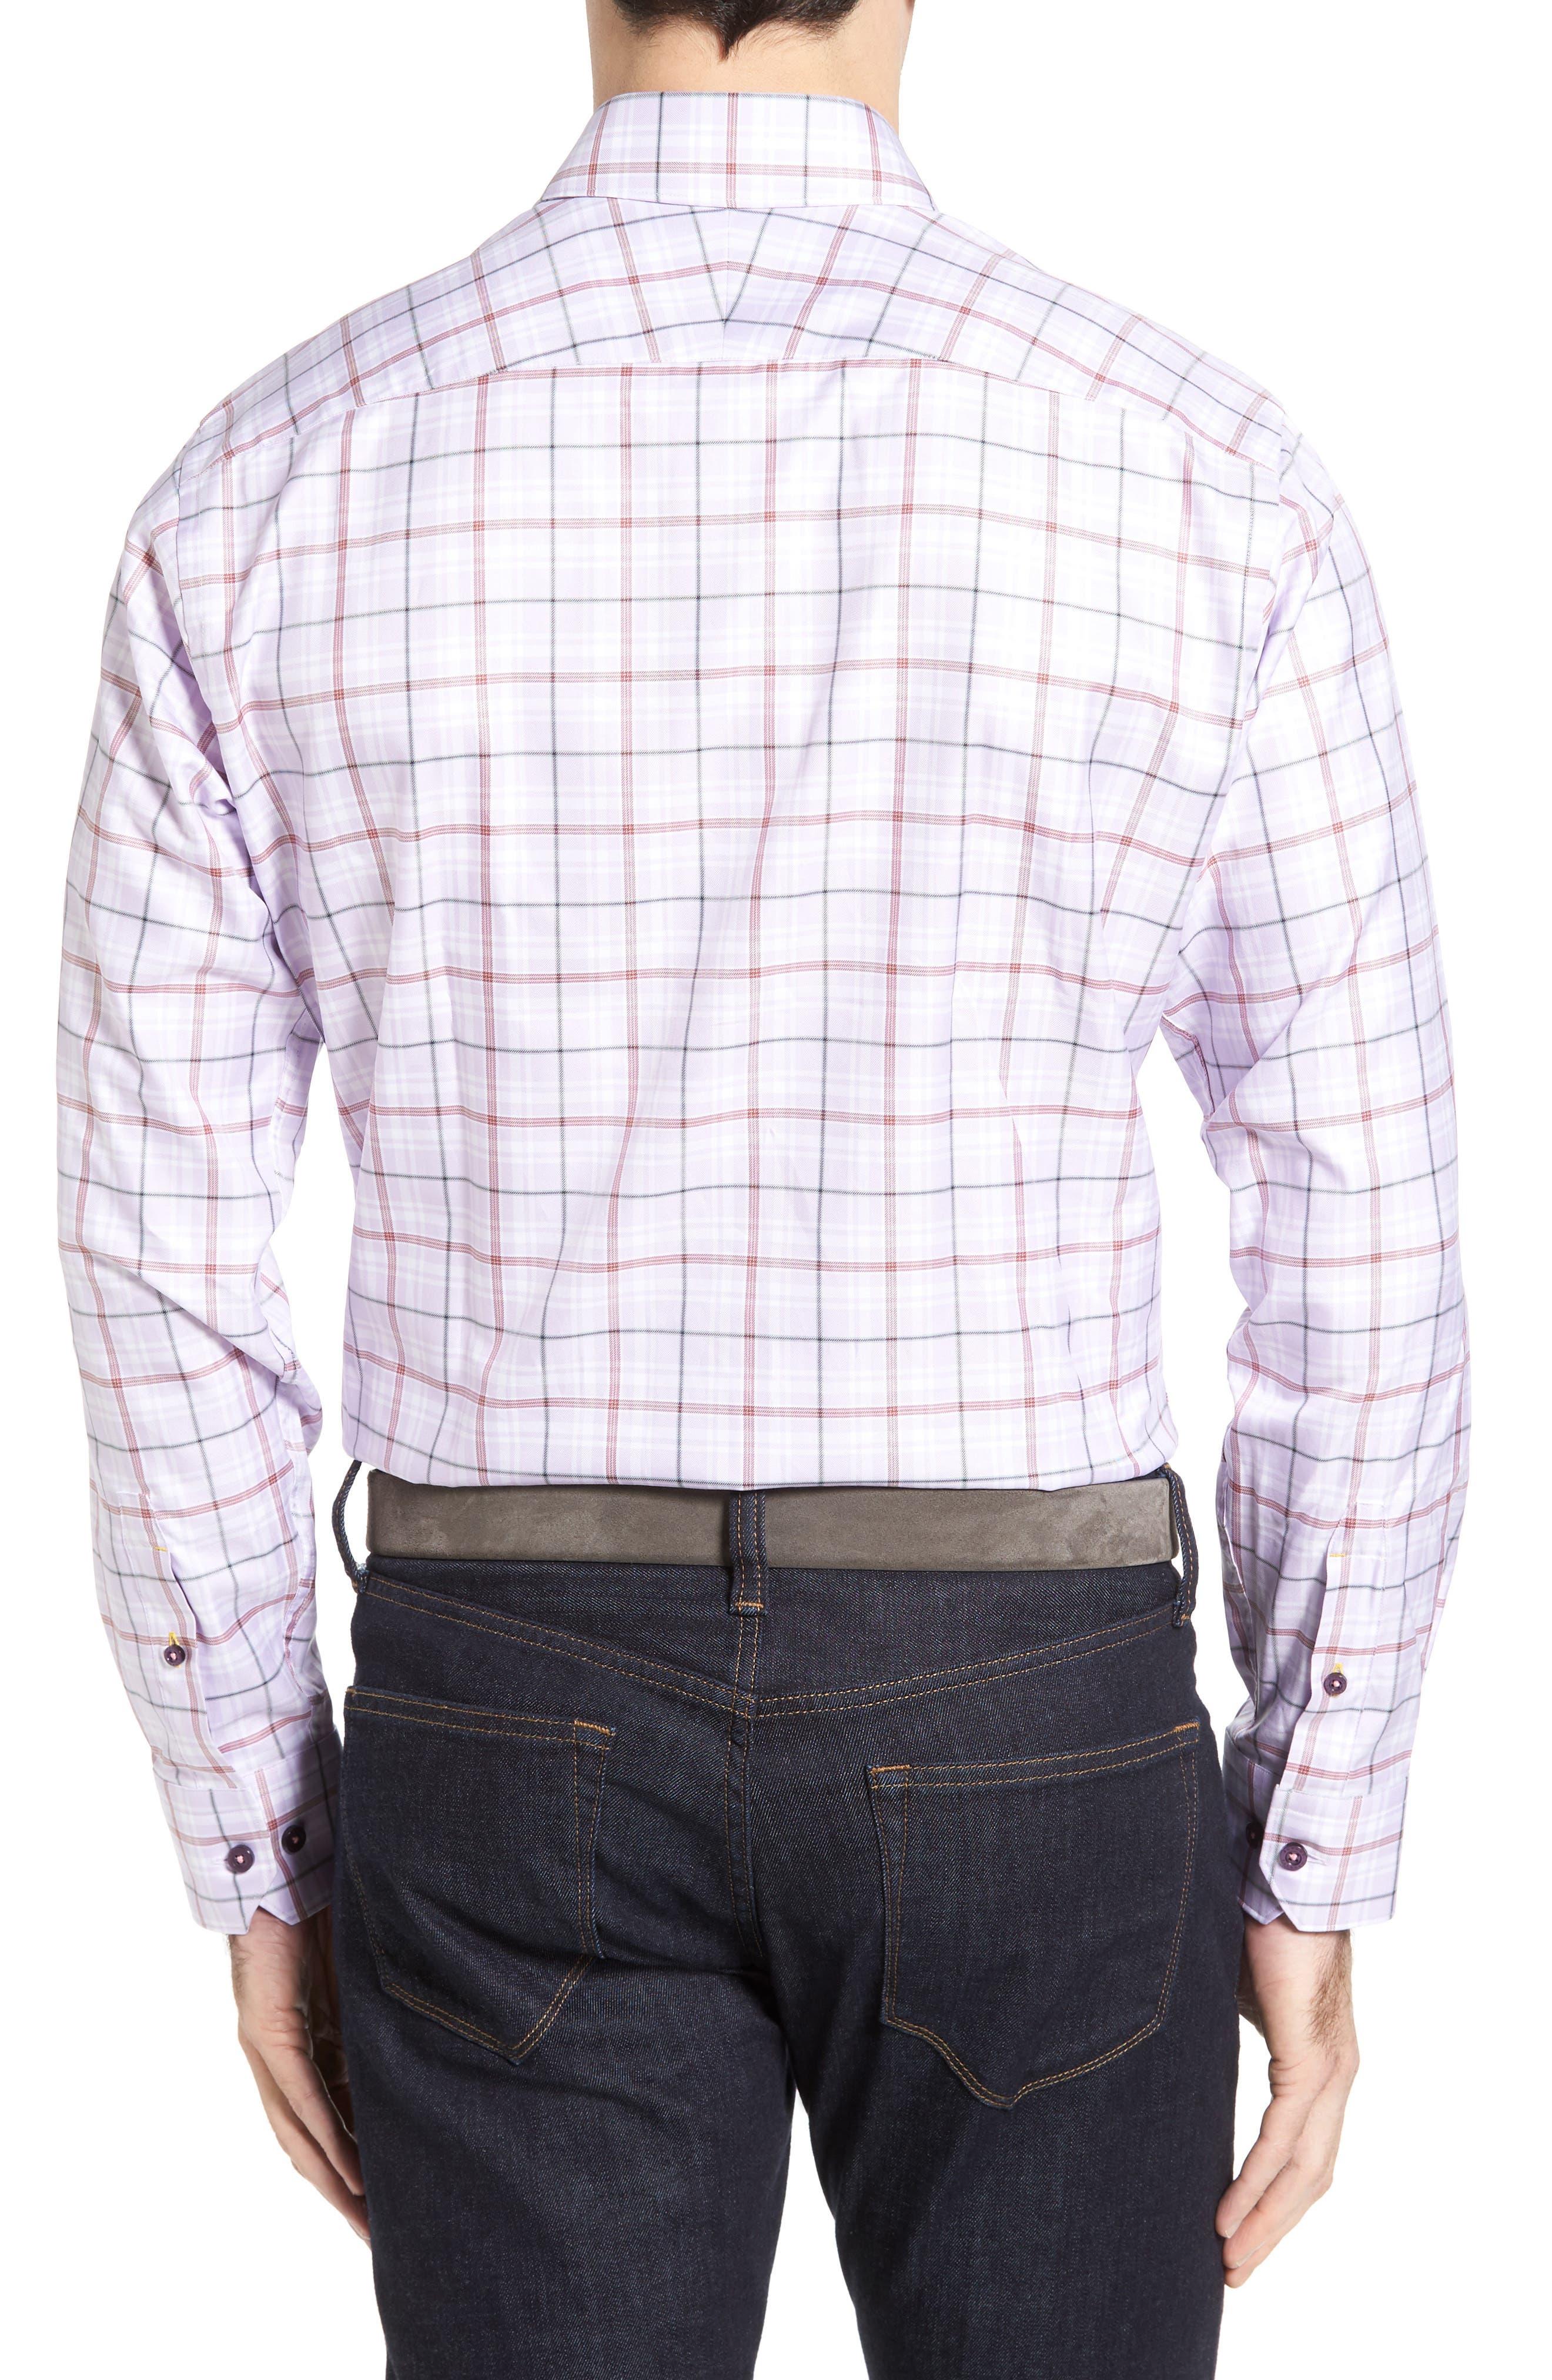 Crespi IV Tailored Fit Sport Shirt,                             Alternate thumbnail 2, color,                             Lavender